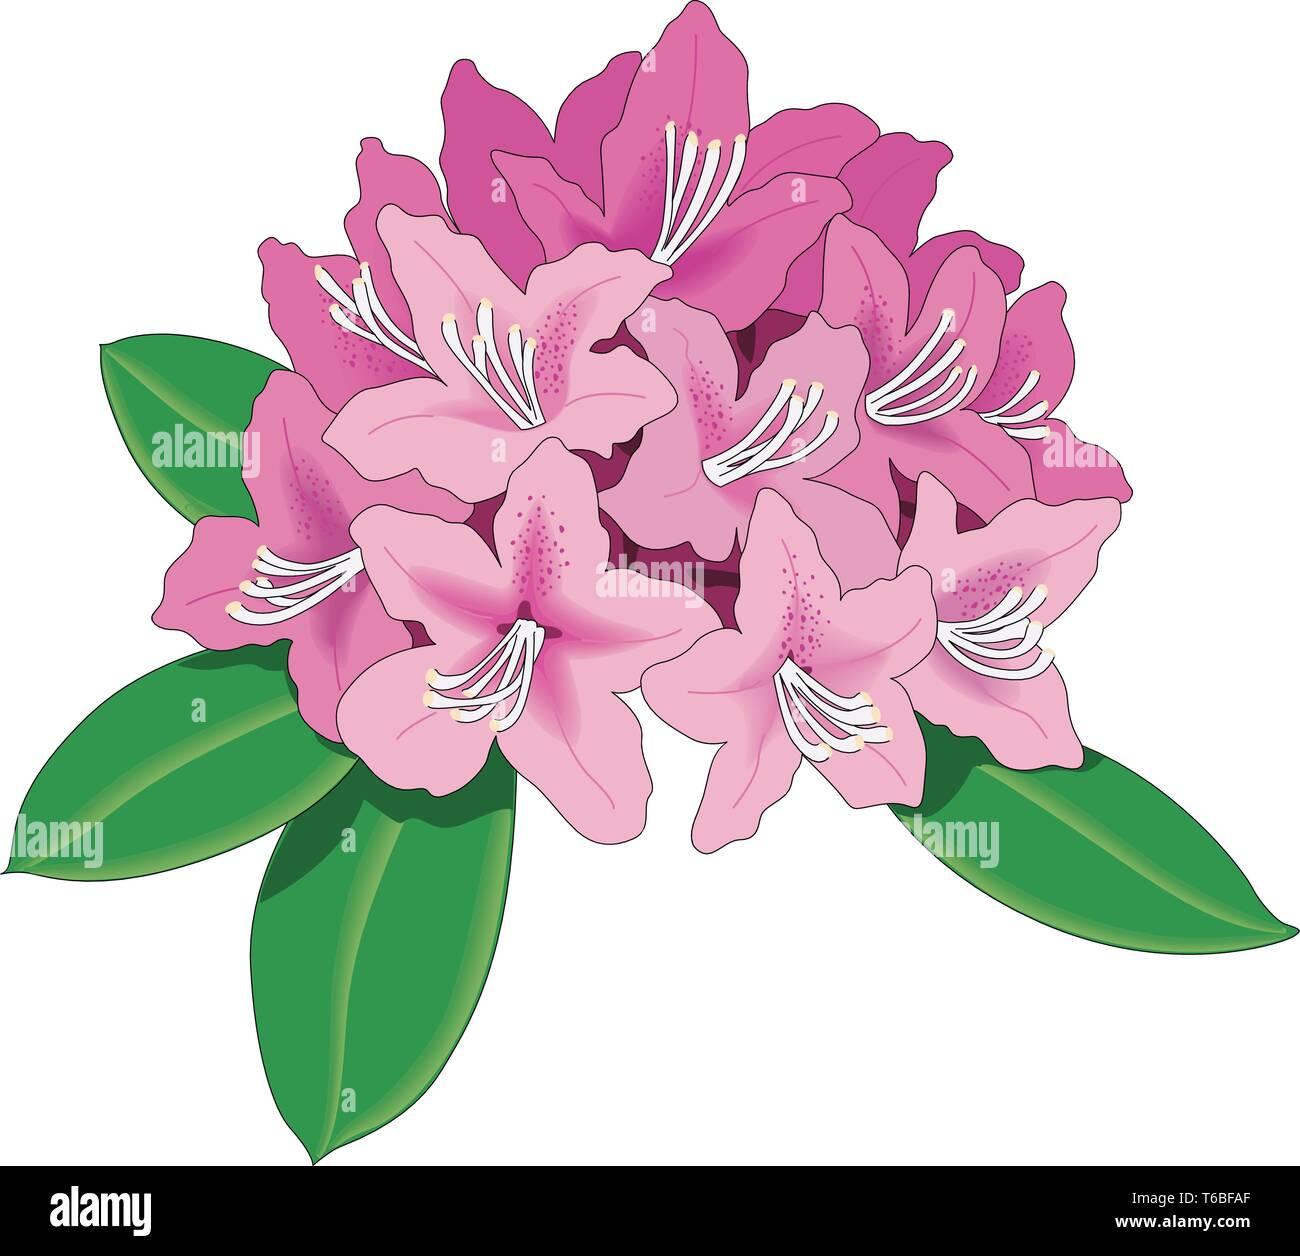 Rhododendron Vector Illustration - Stock Vector